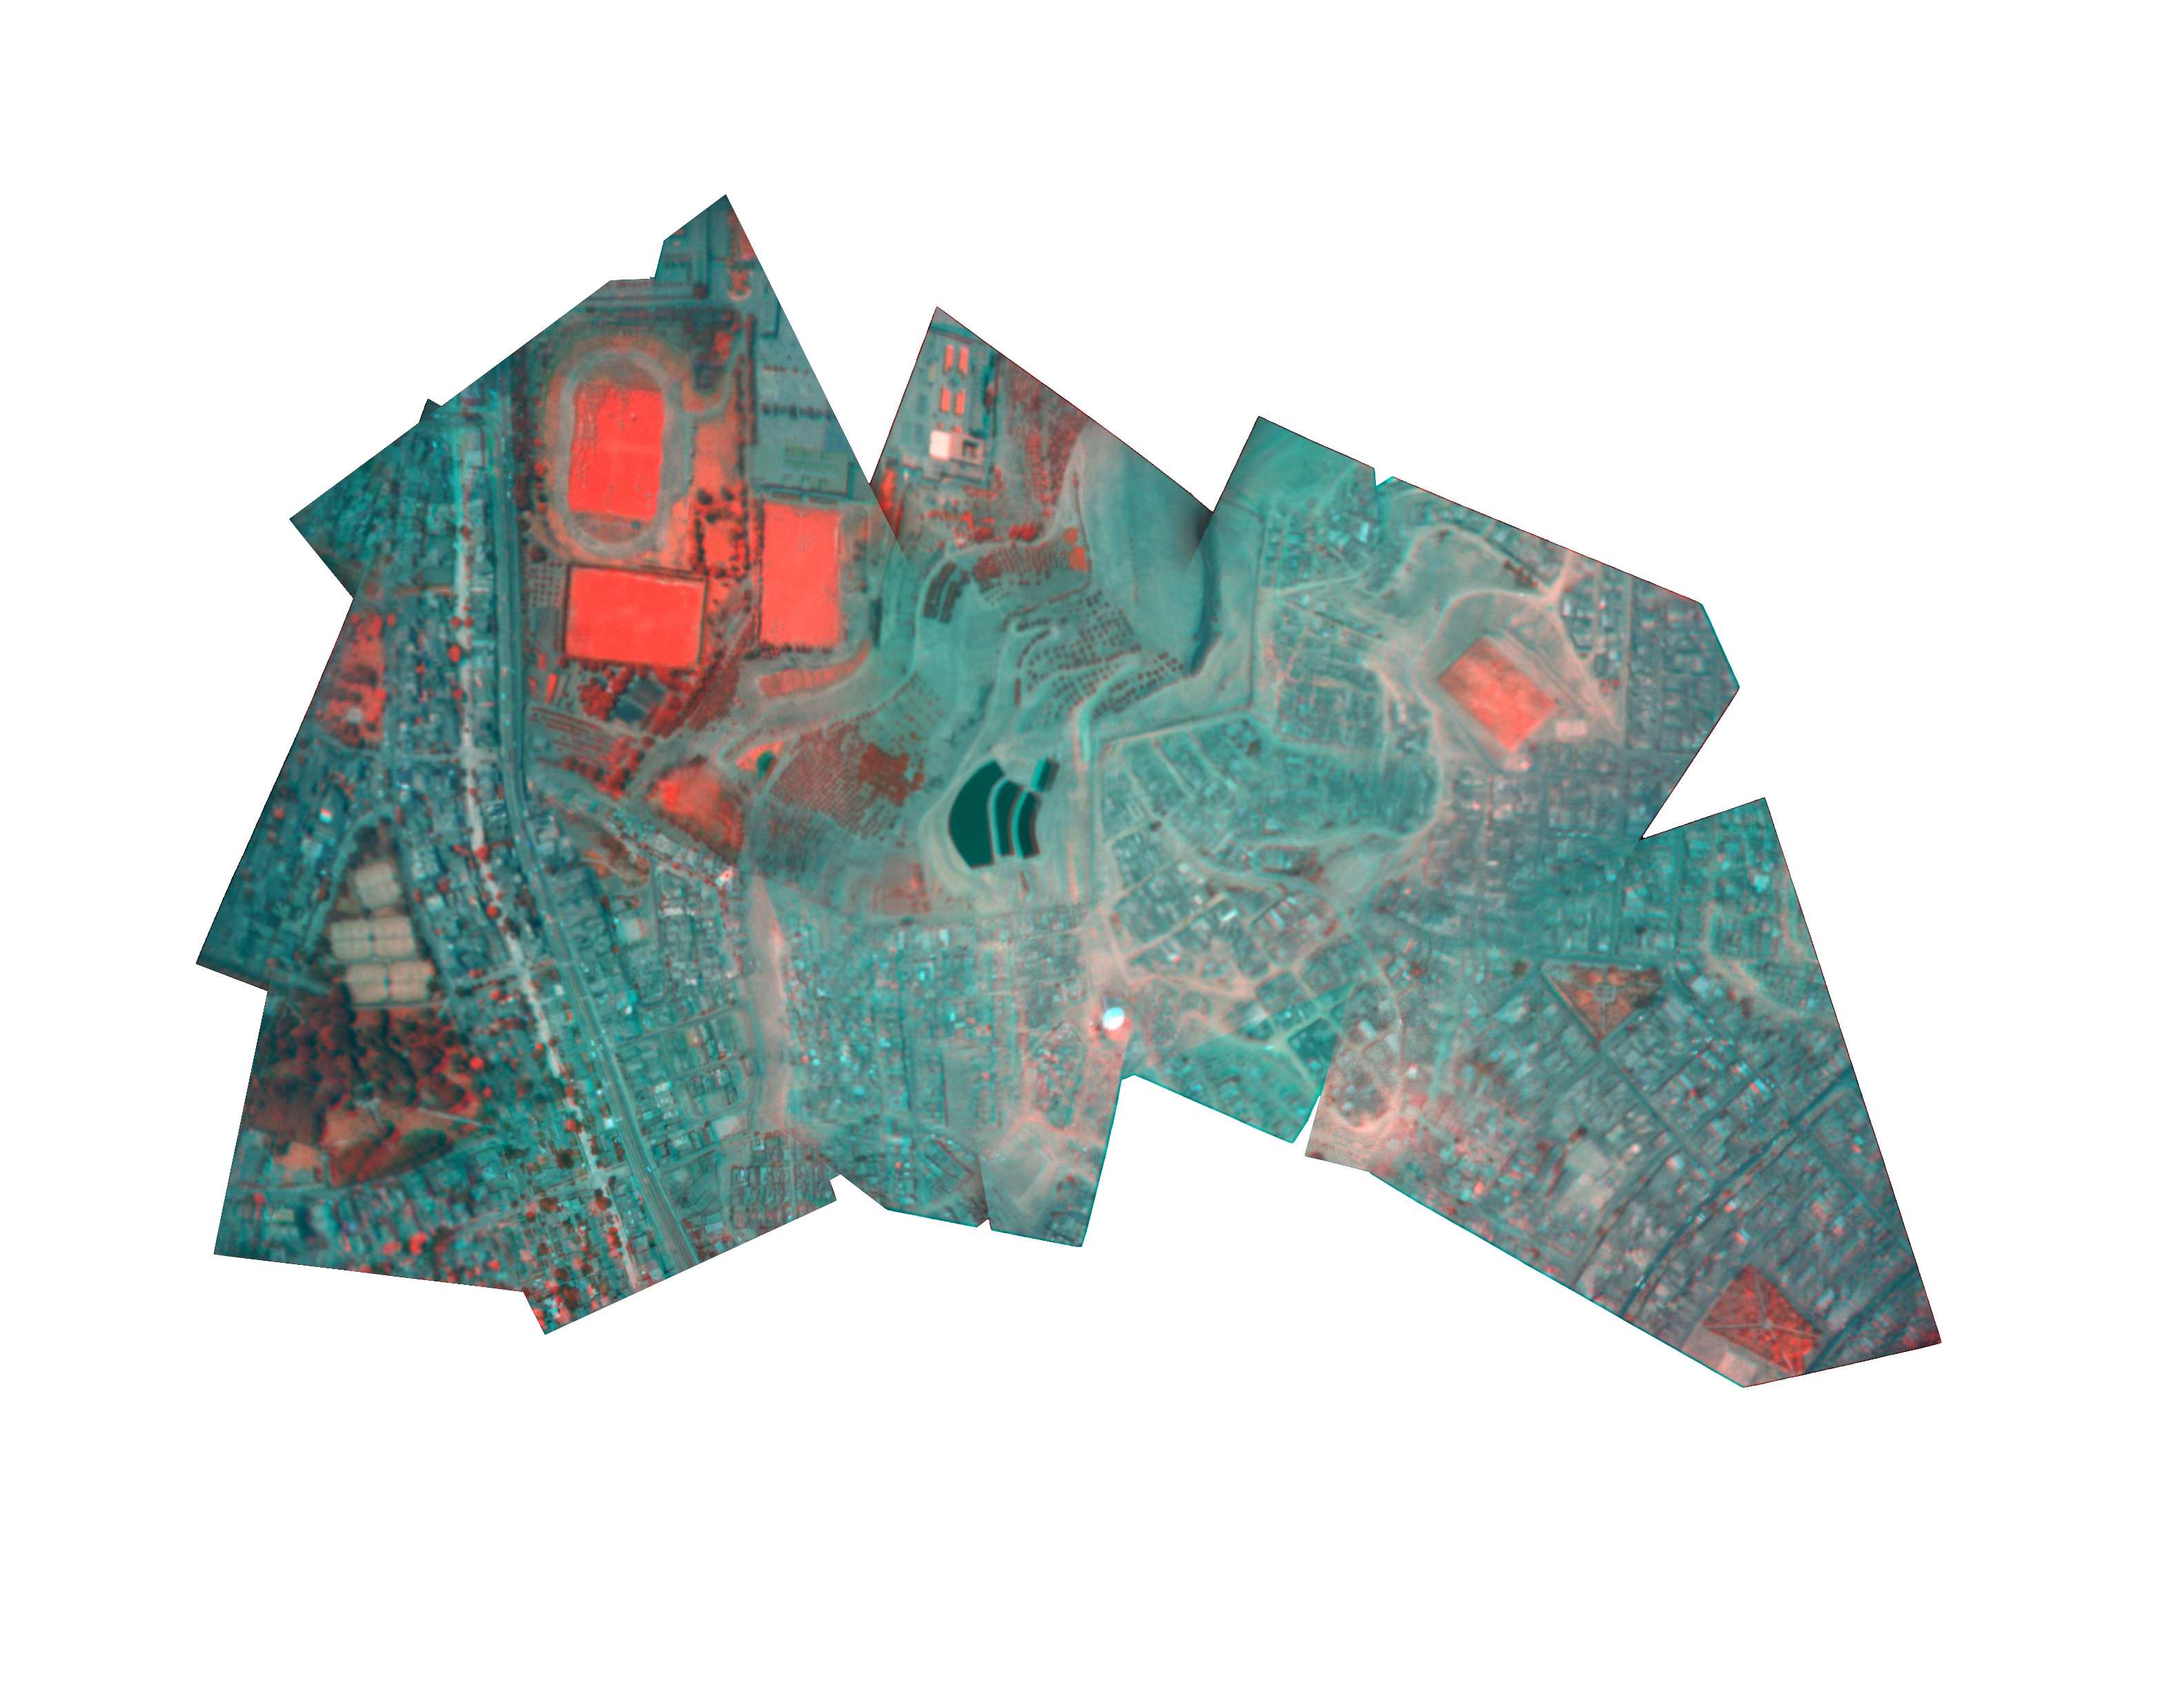 lima-morflex-nrg